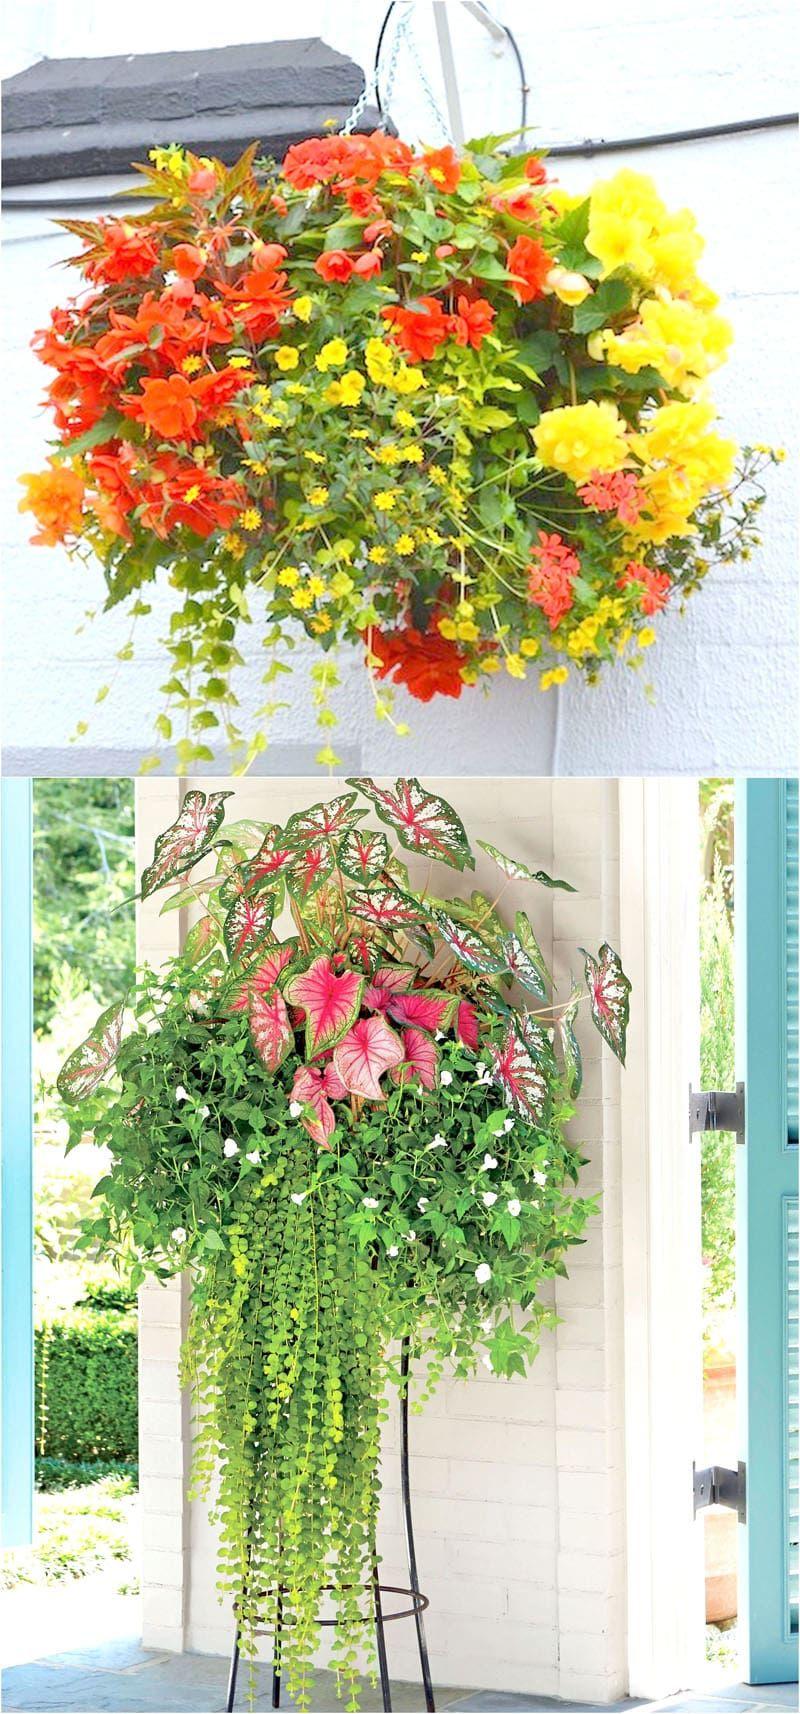 15 Beautiful Flower Hanging Baskets Best Plant Lists Plants For Hanging Baskets Hanging Plants Outdoor Hanging Plants Indoor